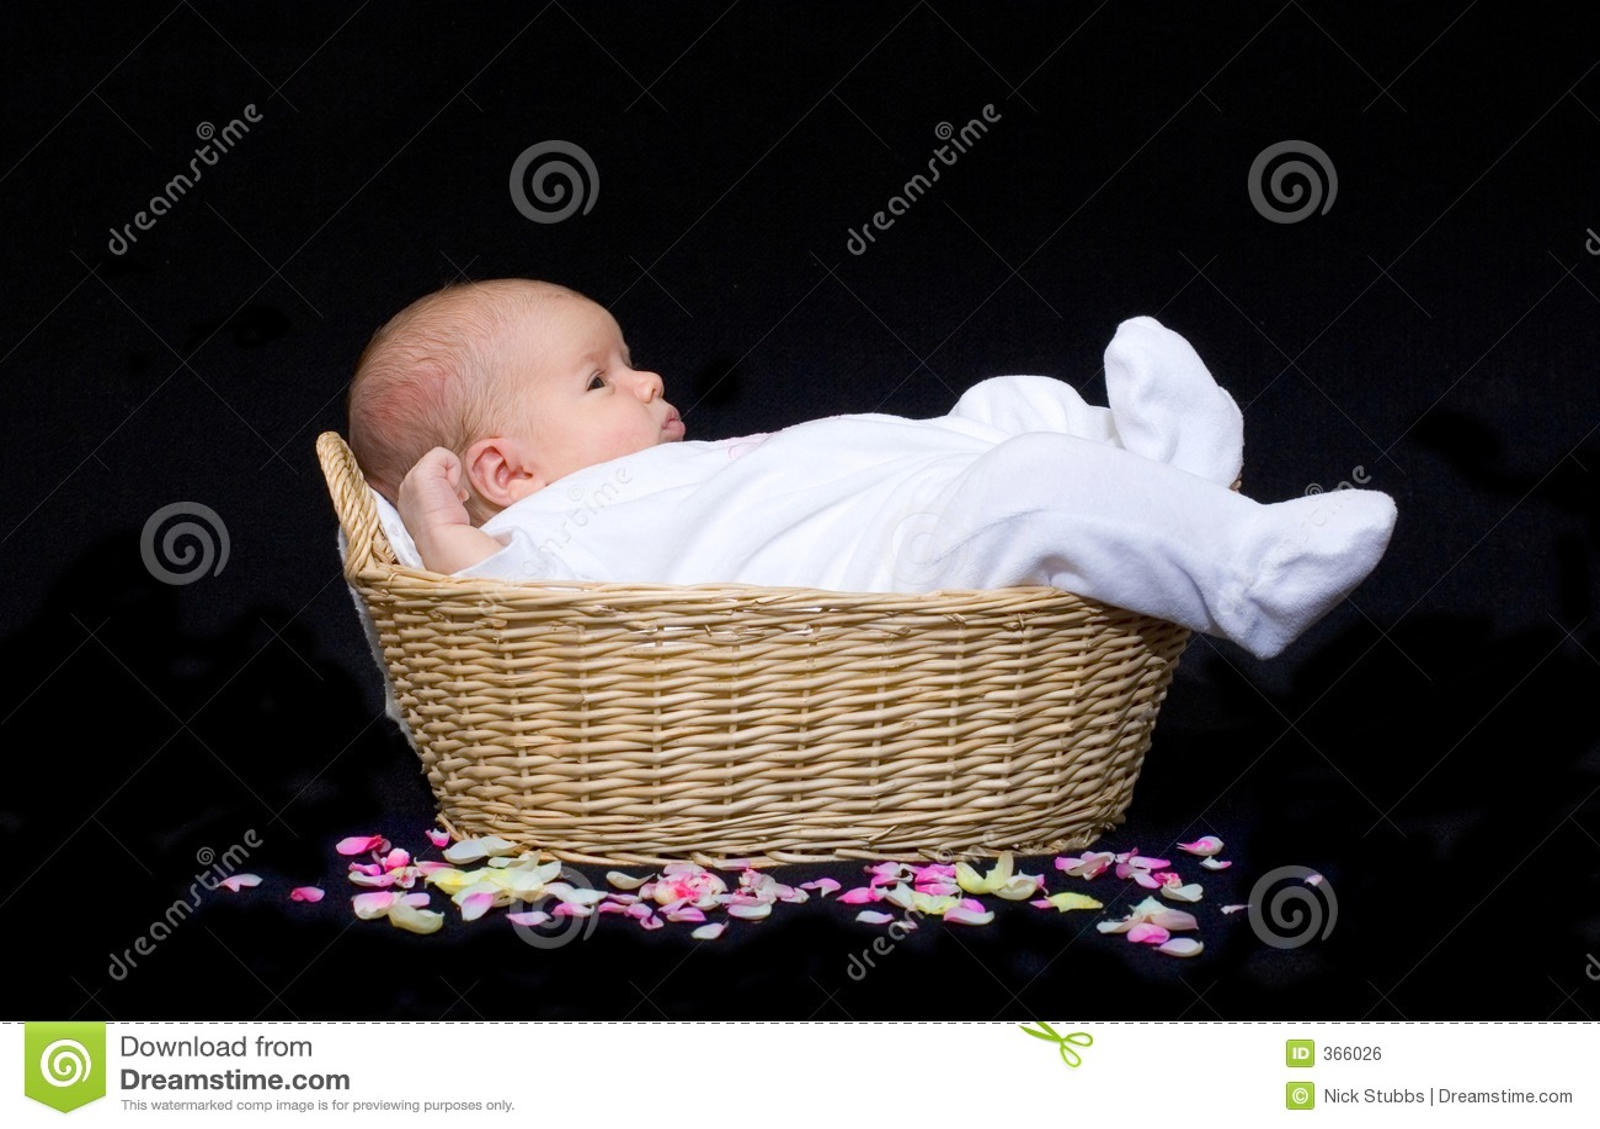 Newborn baby in a basket with flower petals